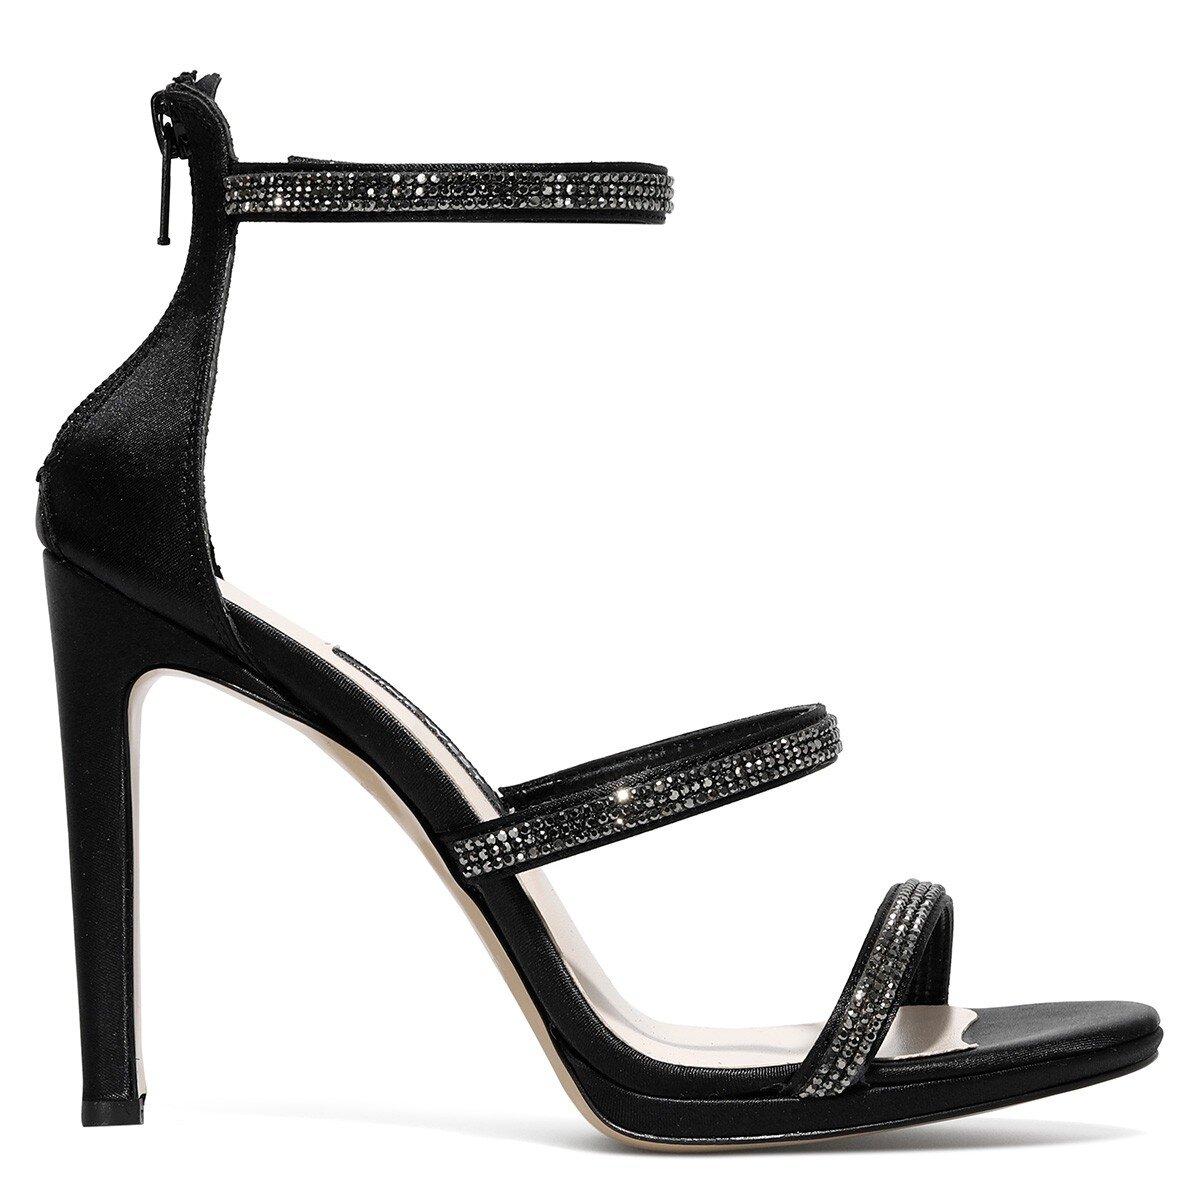 FEMINNA 1FX Siyah Kadın Topuklu Sandalet